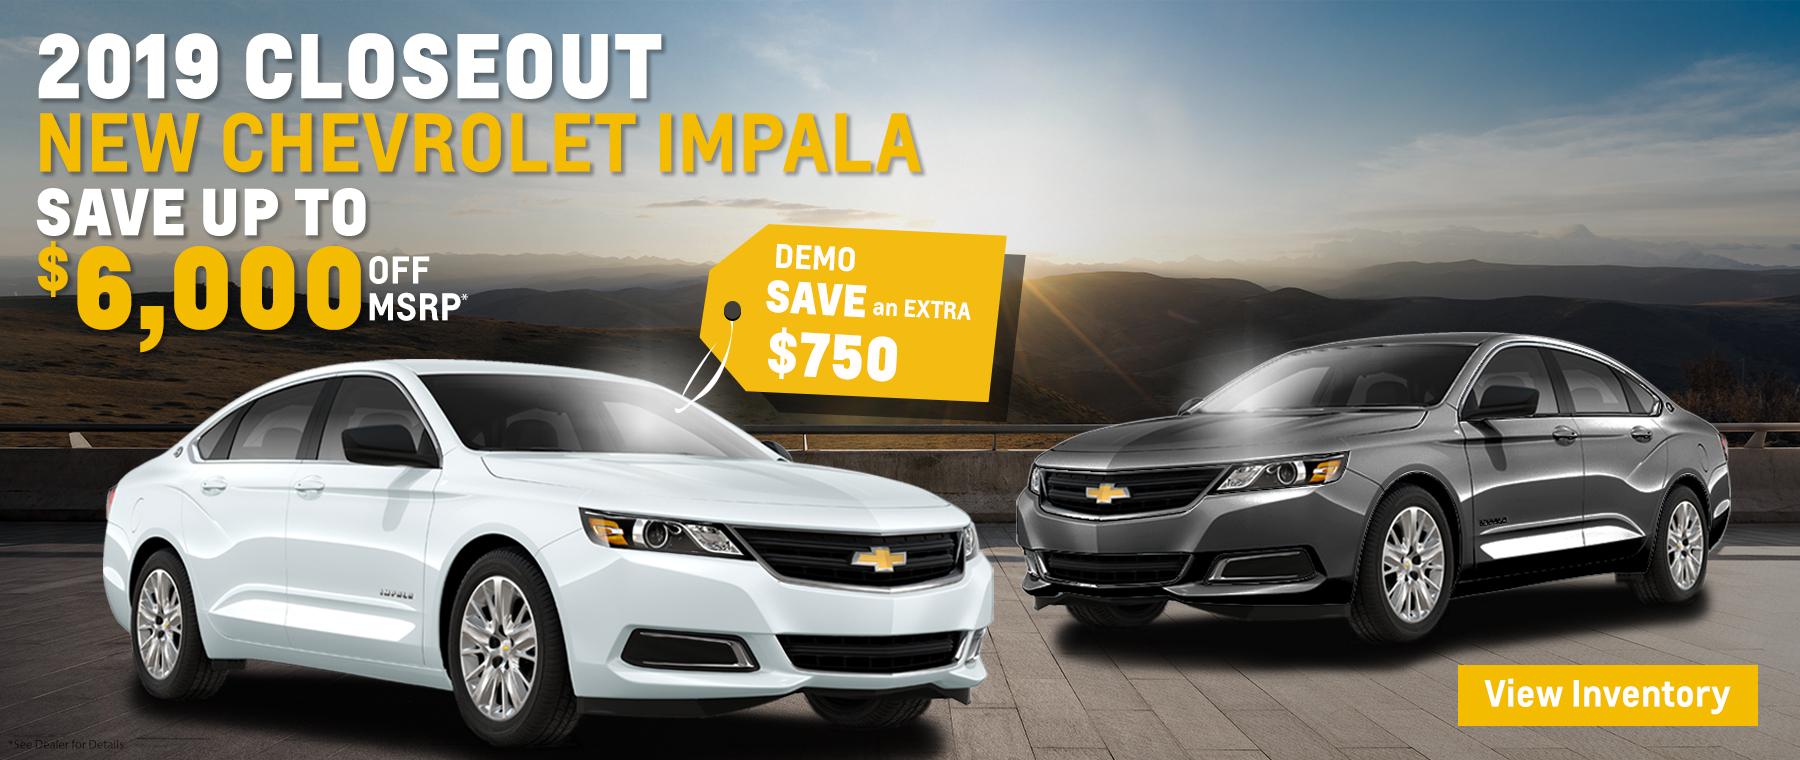 RW Chevy Closeout Impala – Web Banner Desktop